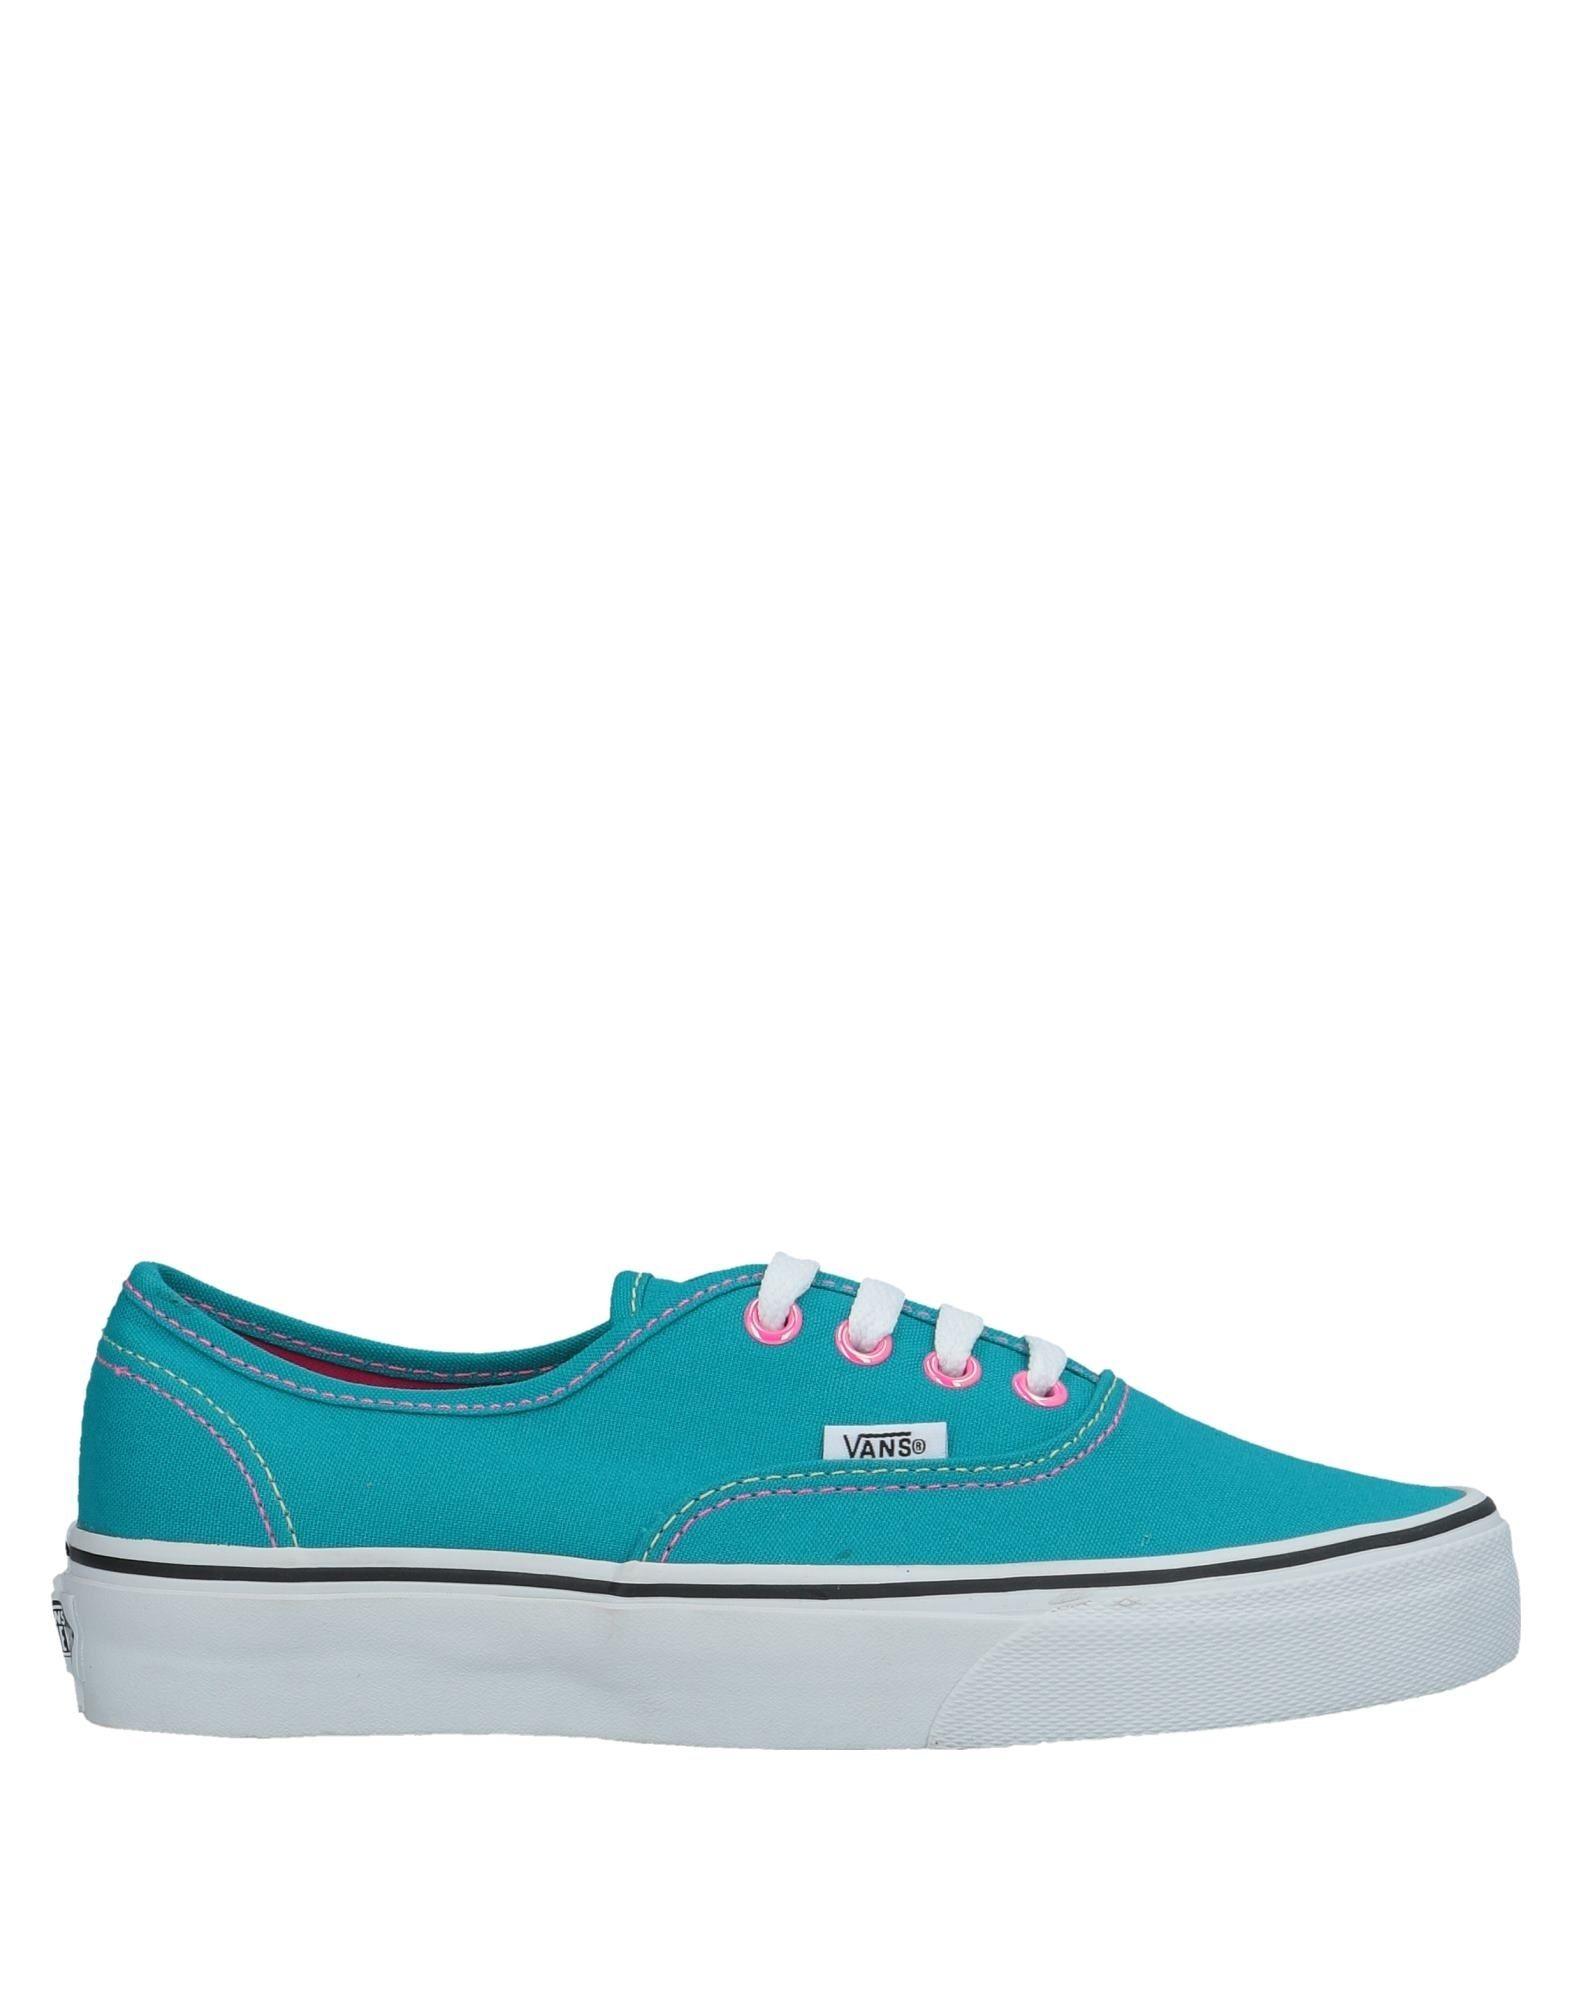 Moda Sneakers Vans Donna - - Donna 11527995FB 20c1c9